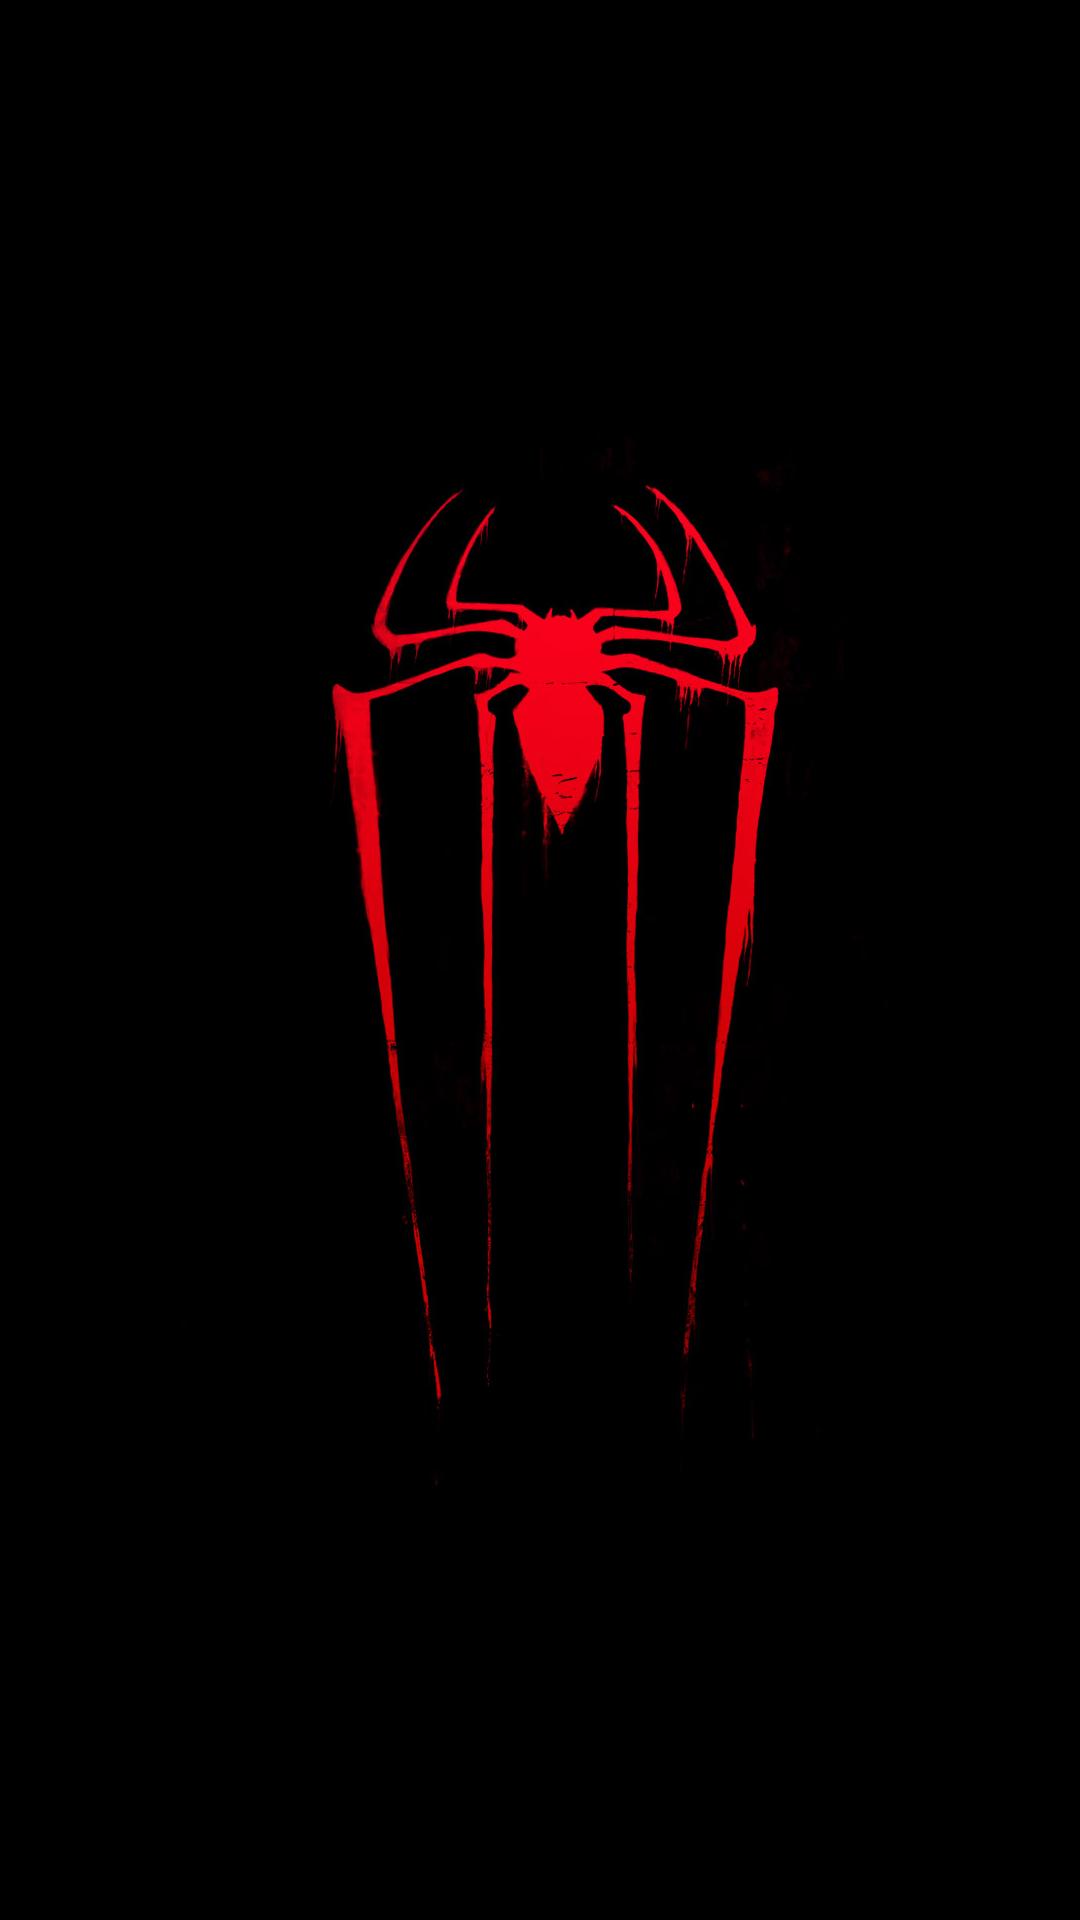 Spiderman HTC Hd Wallpaper Best Htc One 1080x1920 Wallpapers